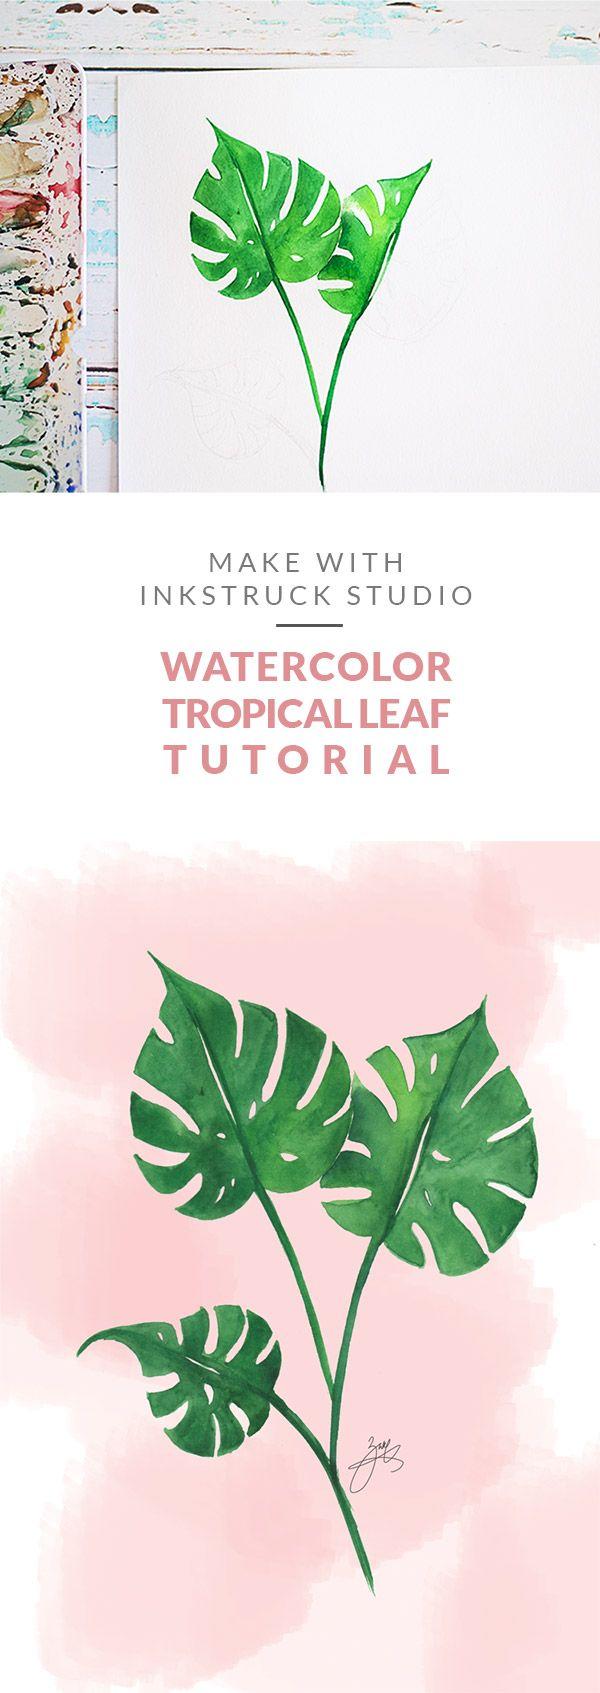 Watercolor Tropical Leaf Tutorial Watercolor Flower Wreath